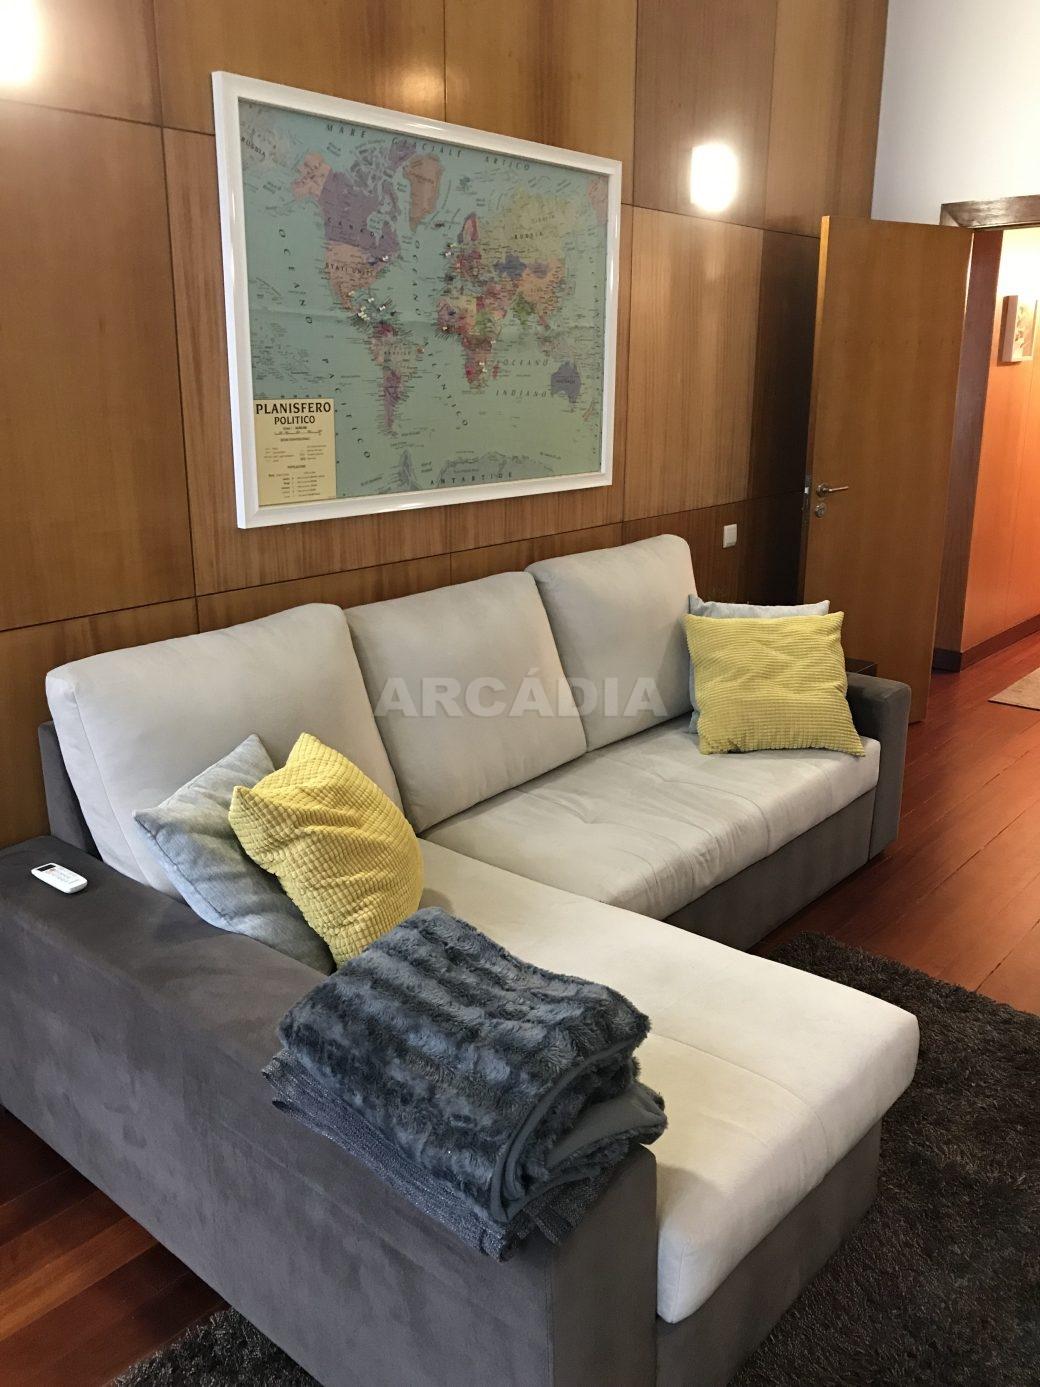 Apartamento-arrendar-centro-braga-3615-10